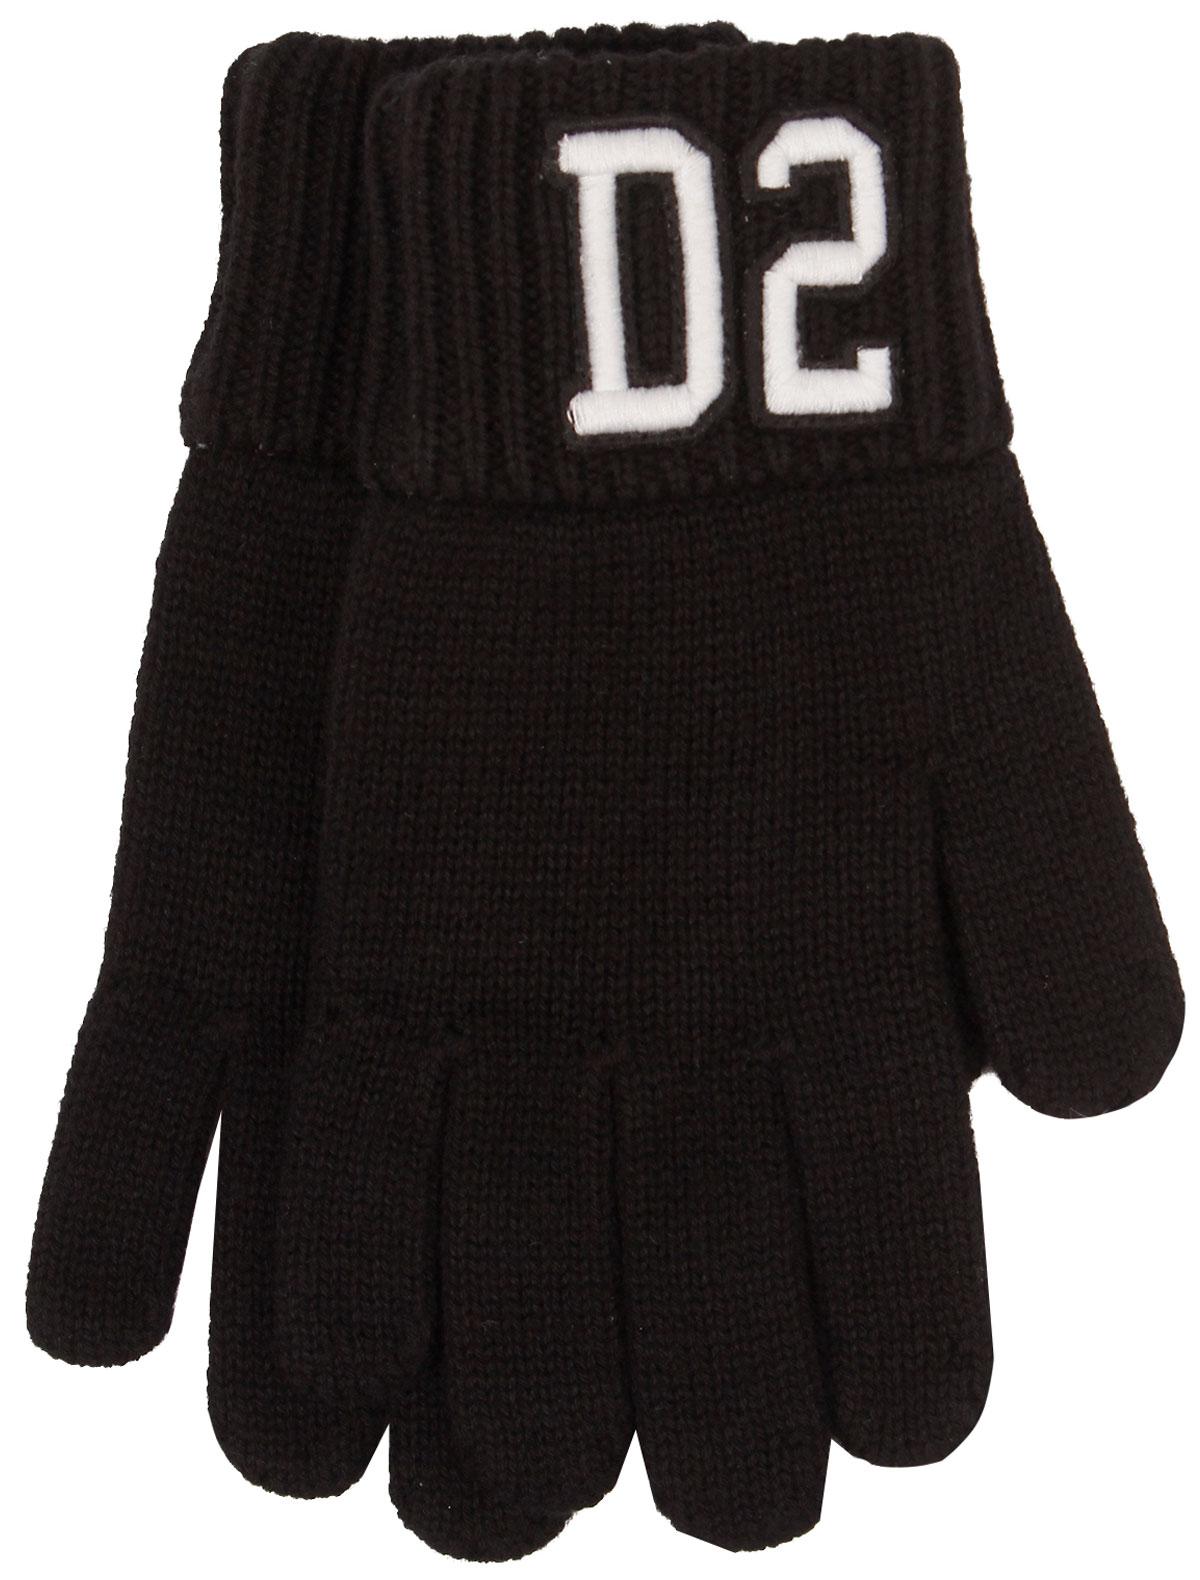 Перчатки Dsquared2 черного цвета